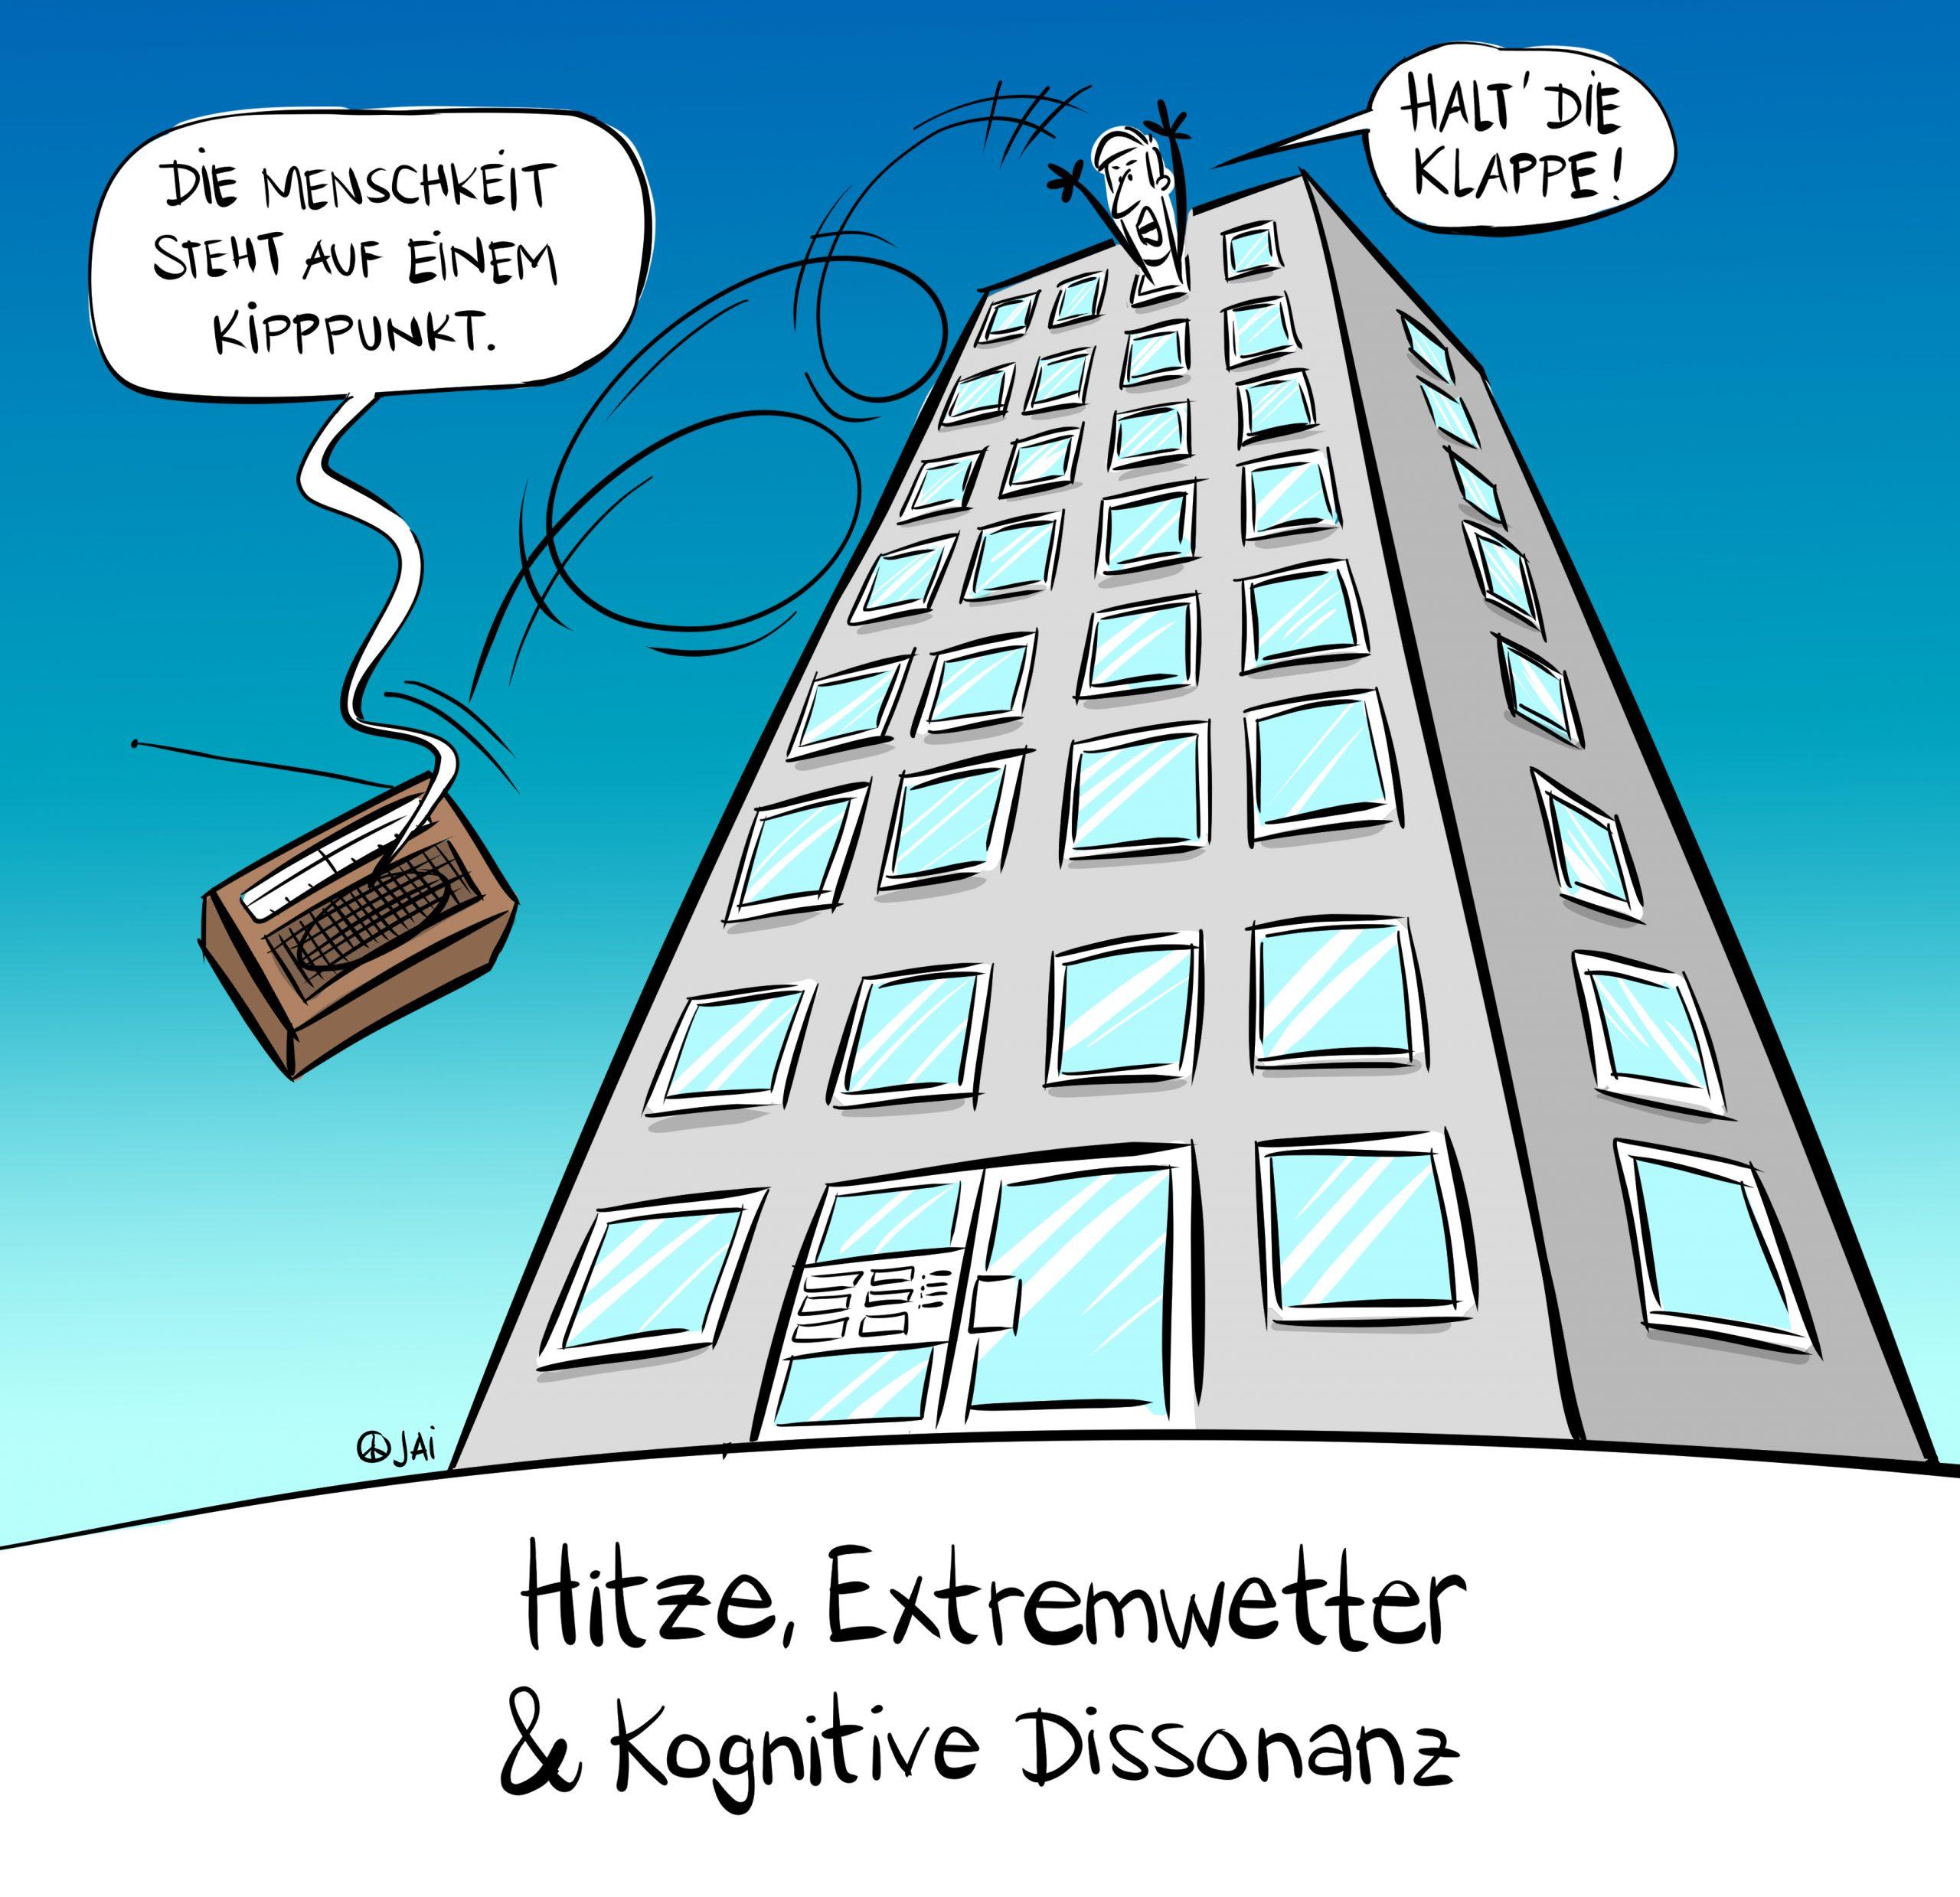 6_kognitive Dissonanz_2